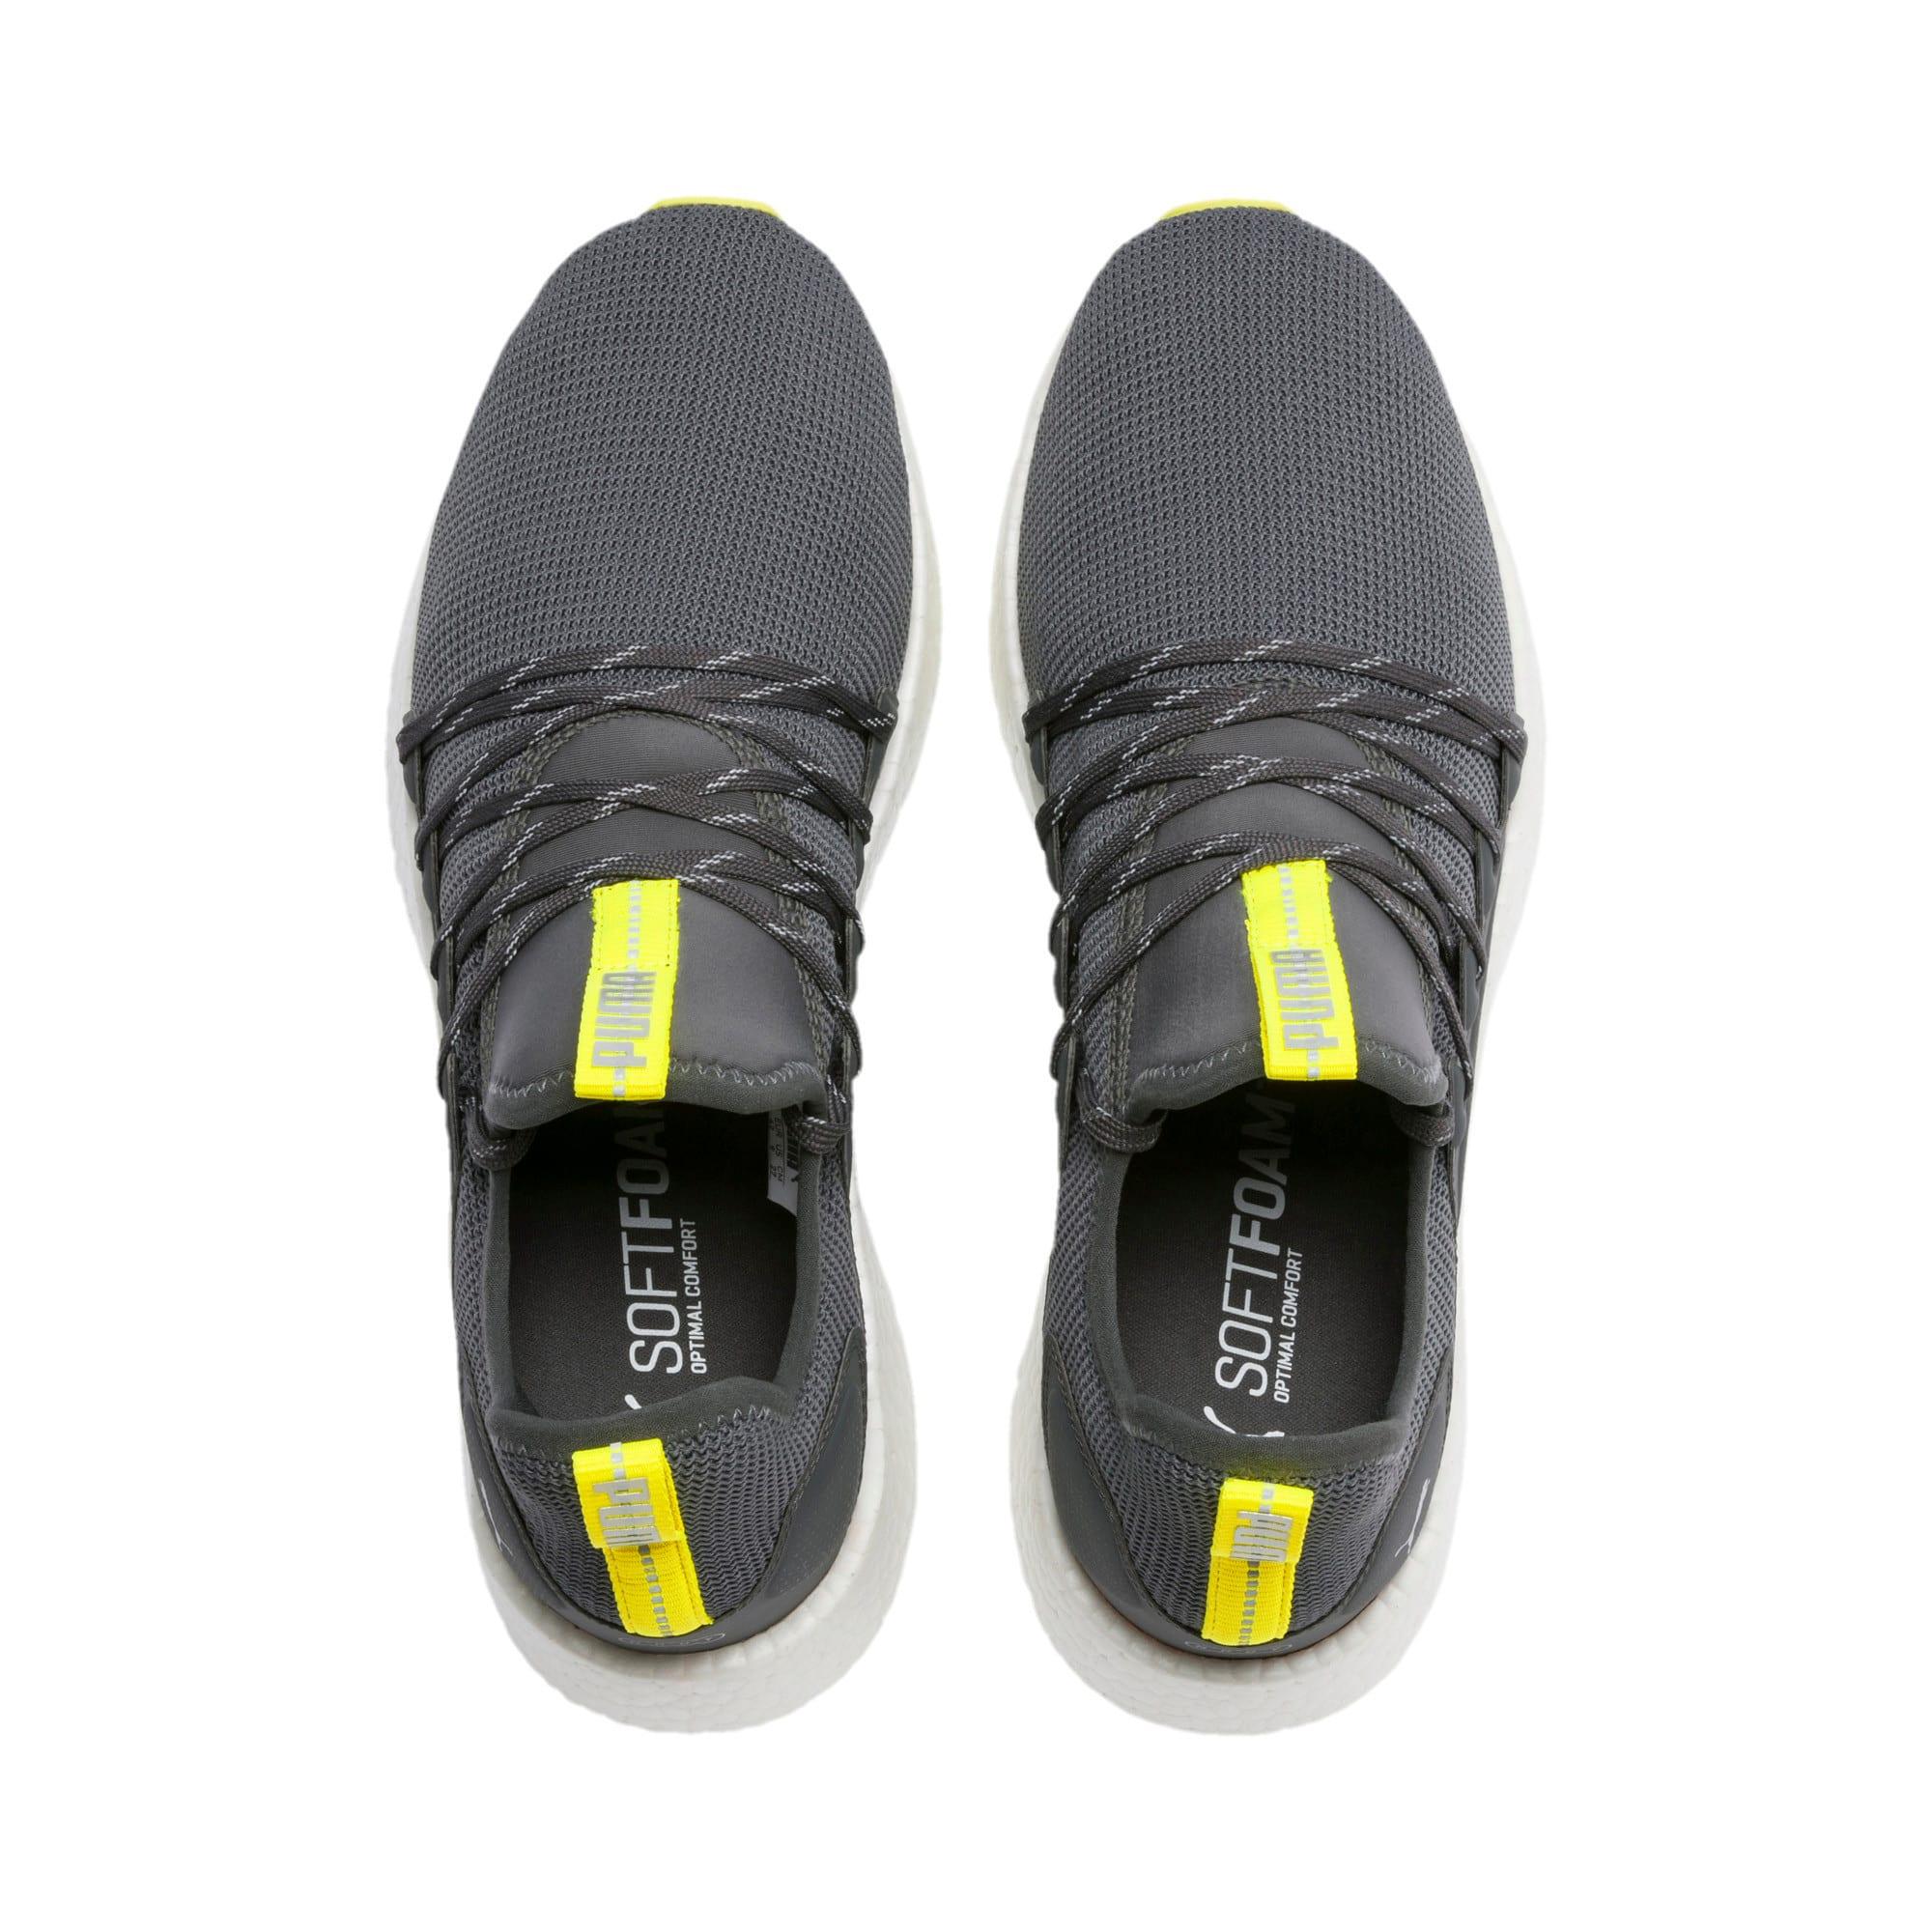 Thumbnail 4 of NRGY Neko Lights Men's Running Shoes, CASTLEROCK-Yellow Alert, medium-IND